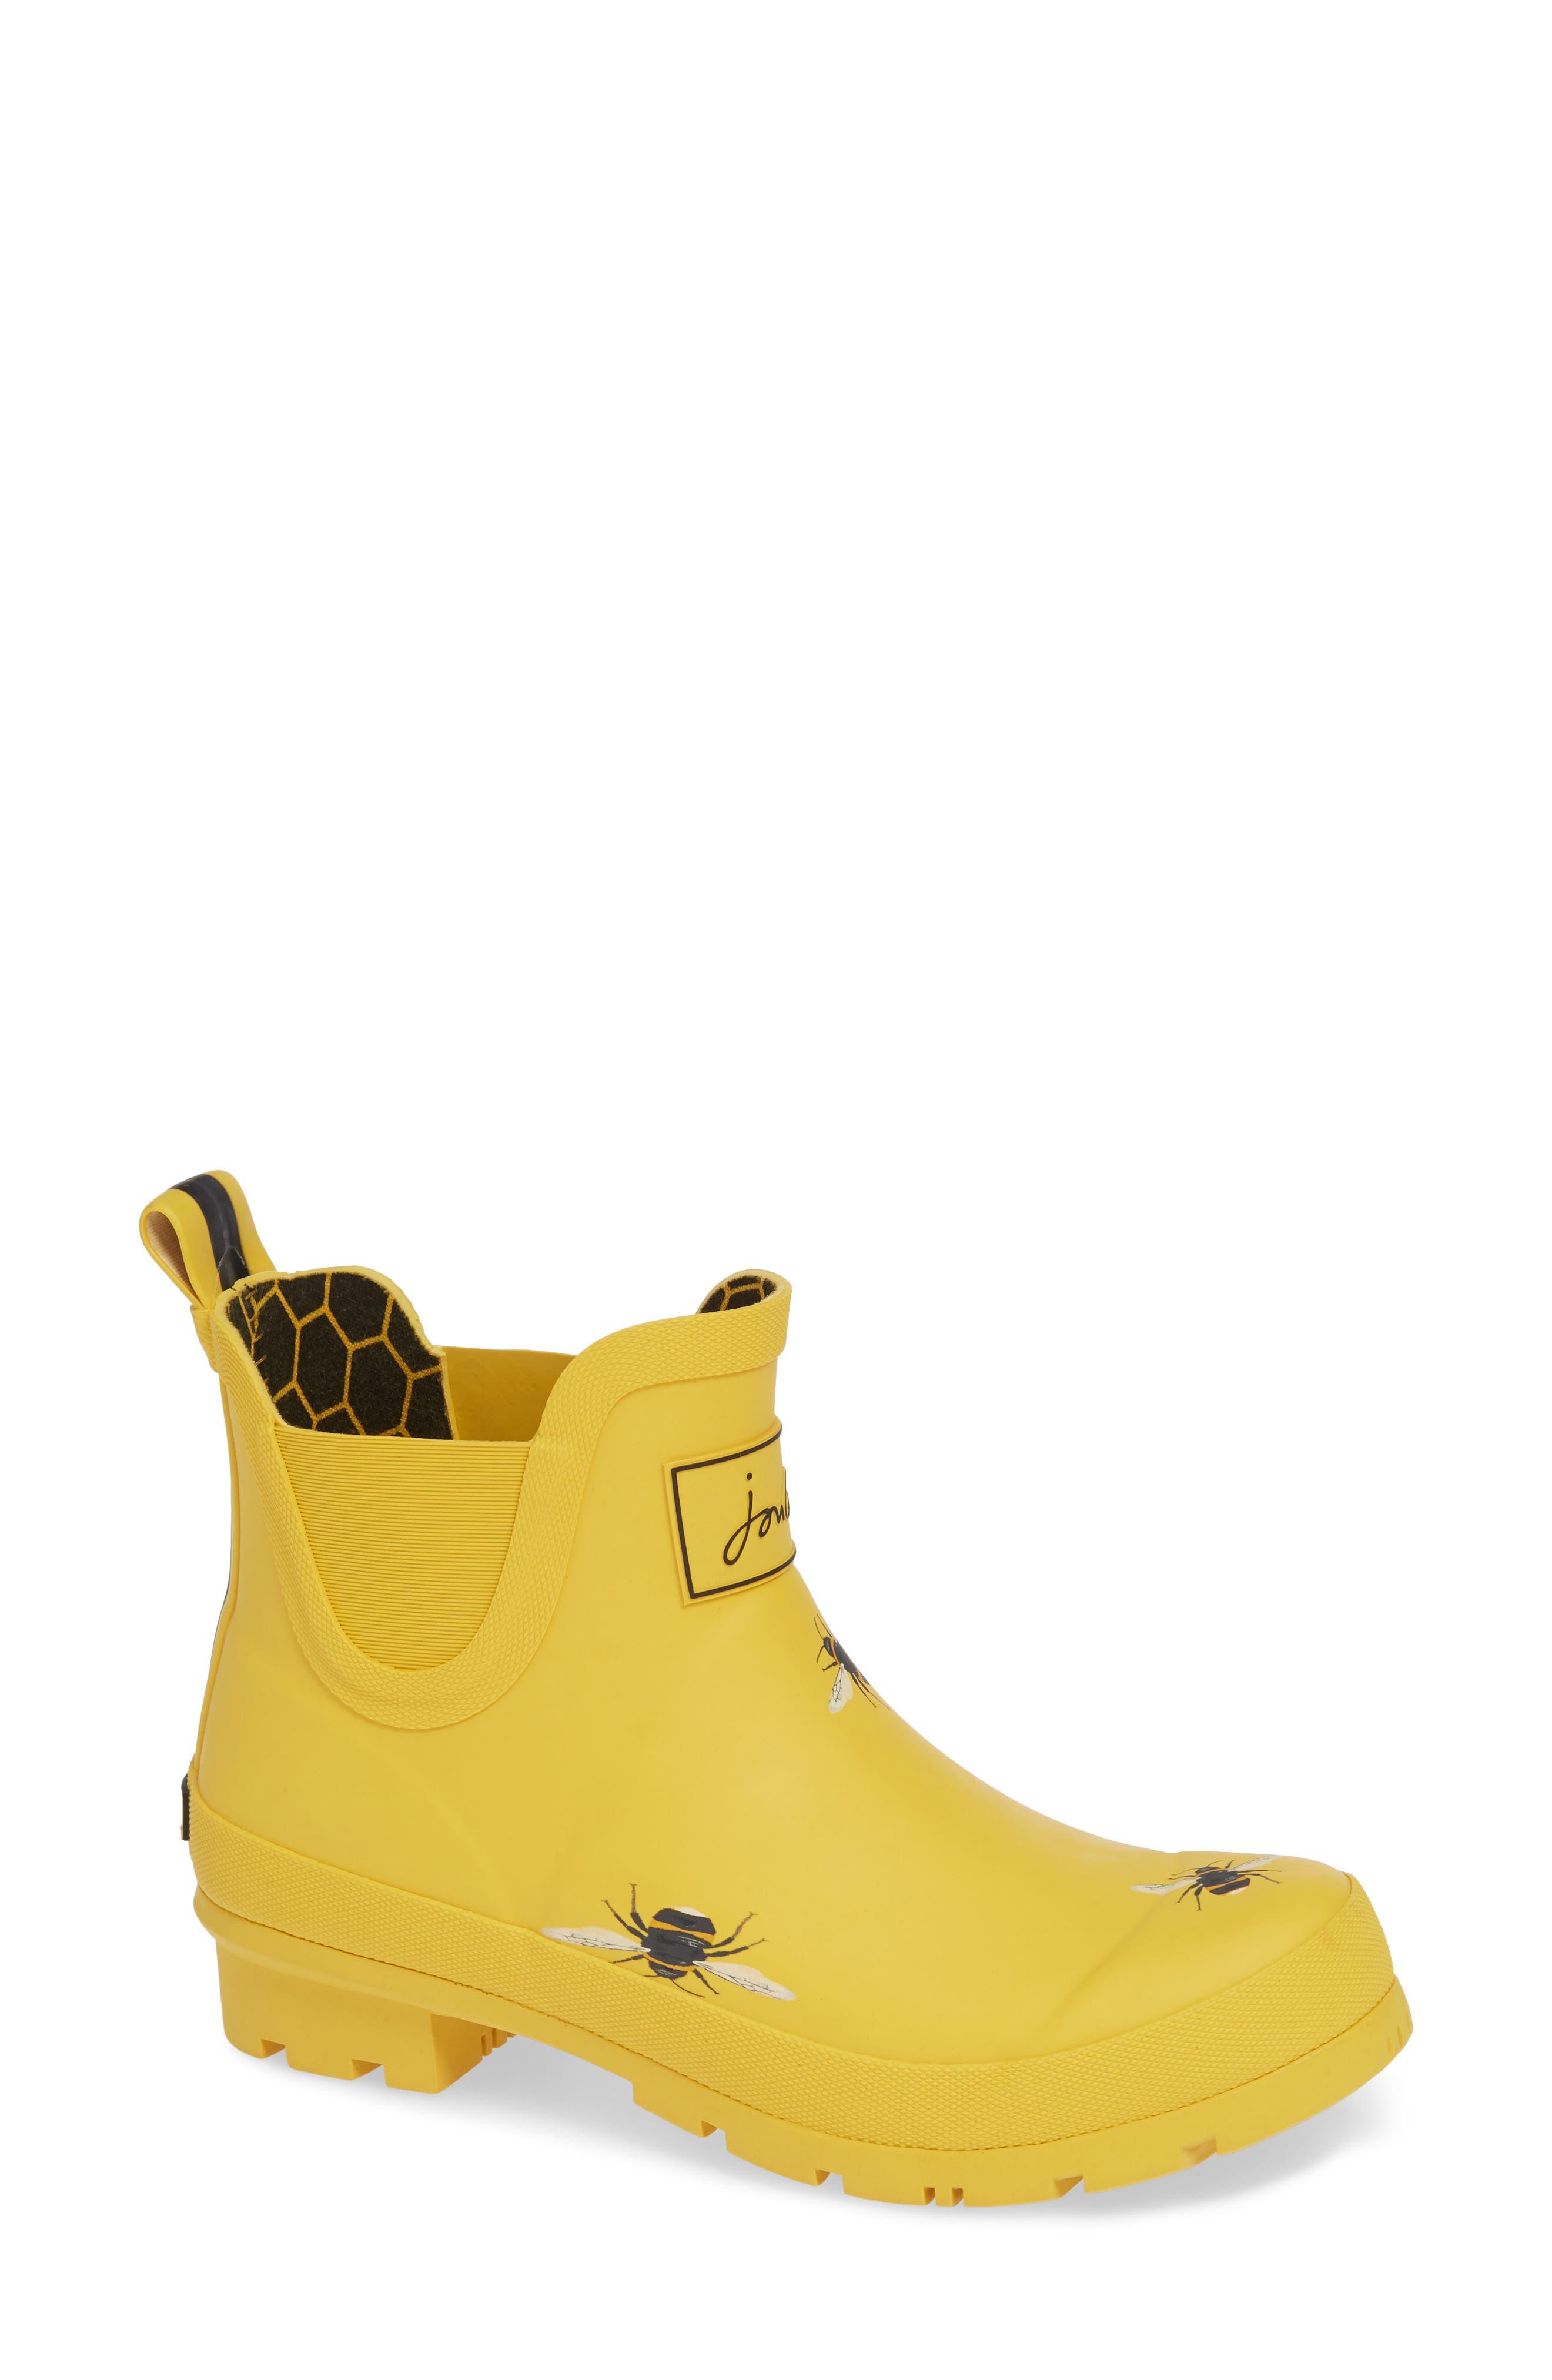 Wellibob Short Rain Boot,                             Main thumbnail 1, color,                             GOLD BOTANICAL BEES